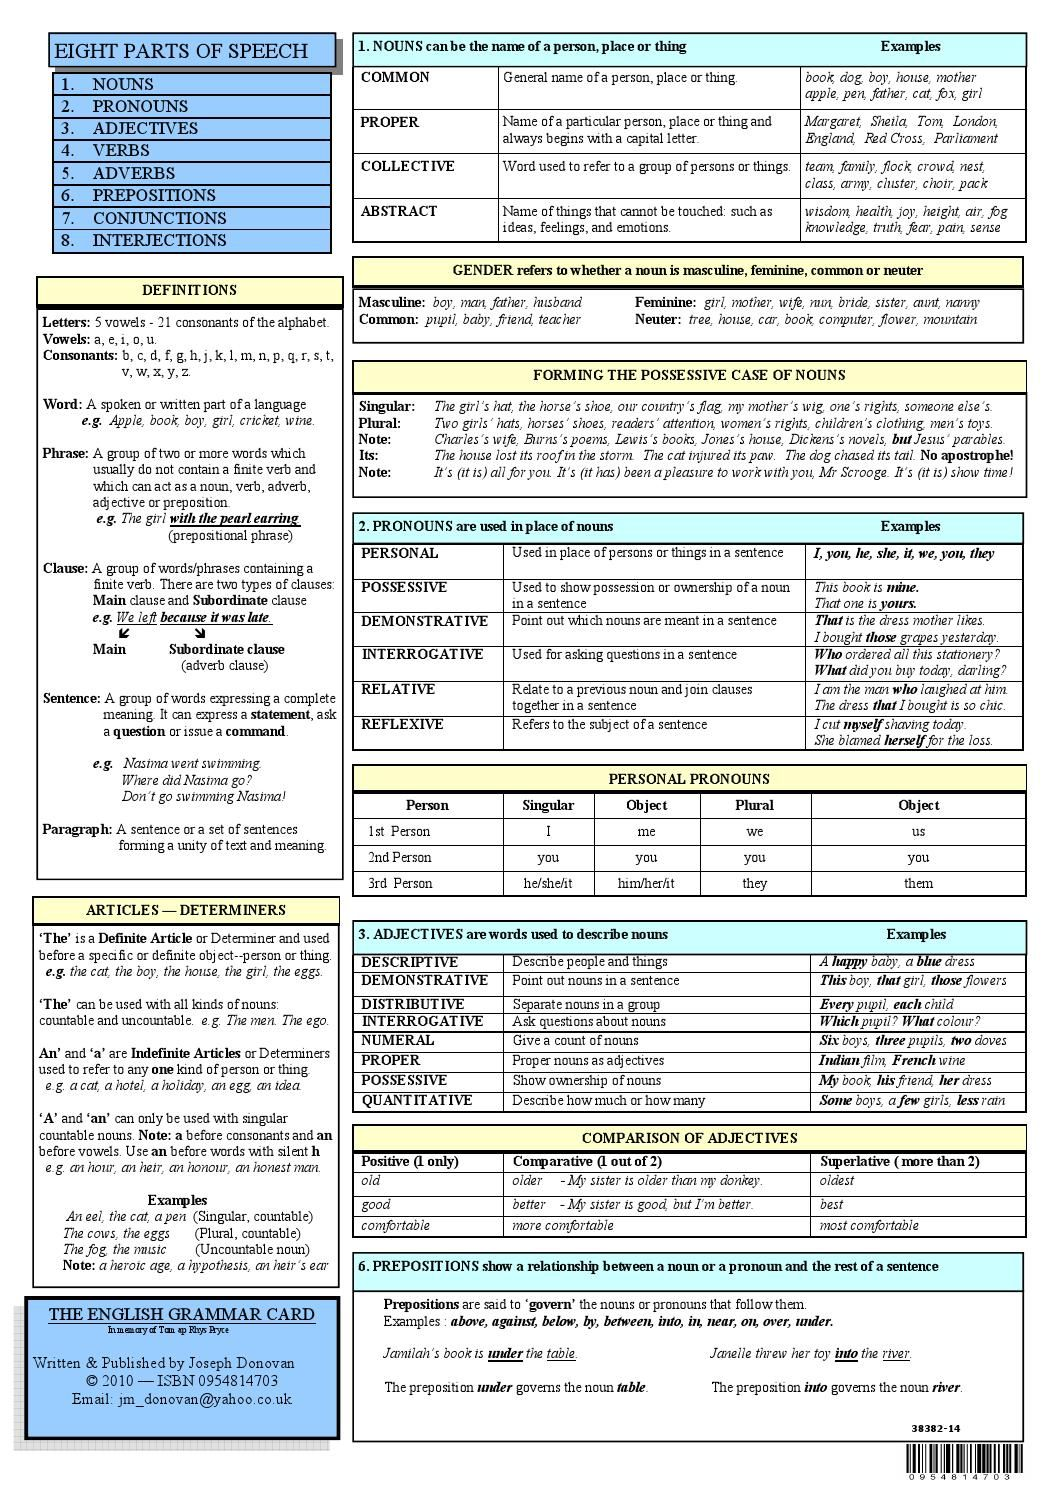 English Grammar Card With Images English Grammar Teaching